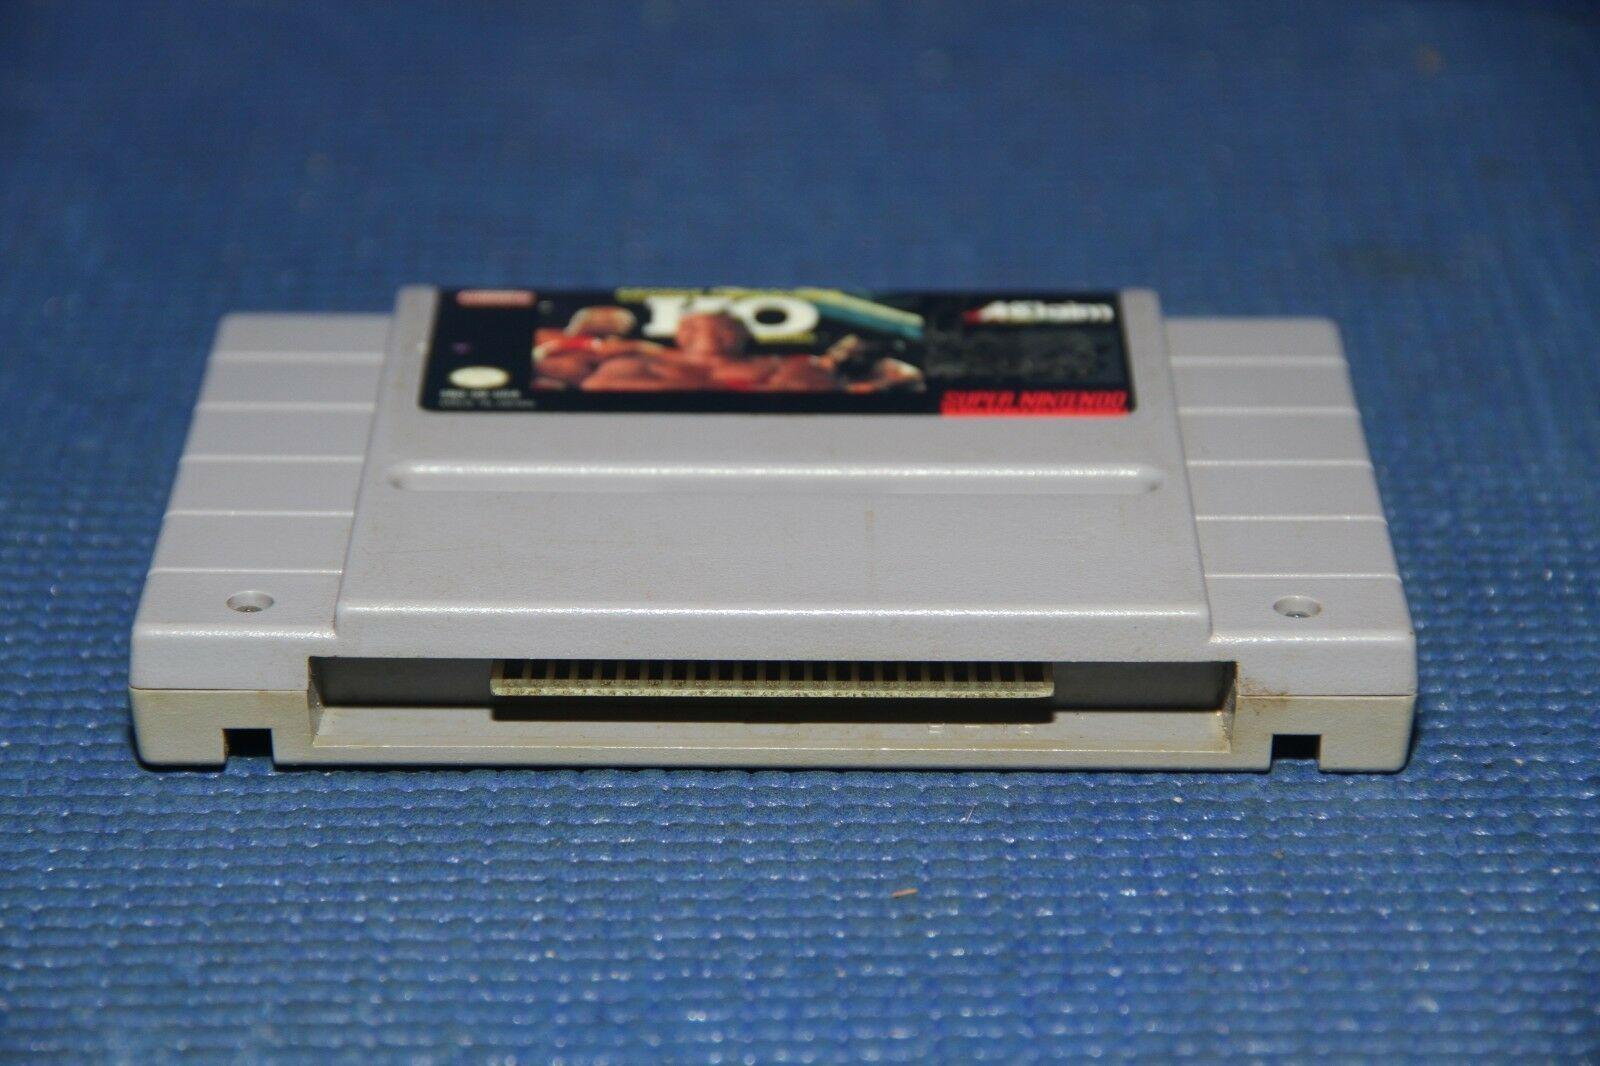 George Foreman's KO Boxing (Super Nintendo Entertainment System, 1993) SNES image 4